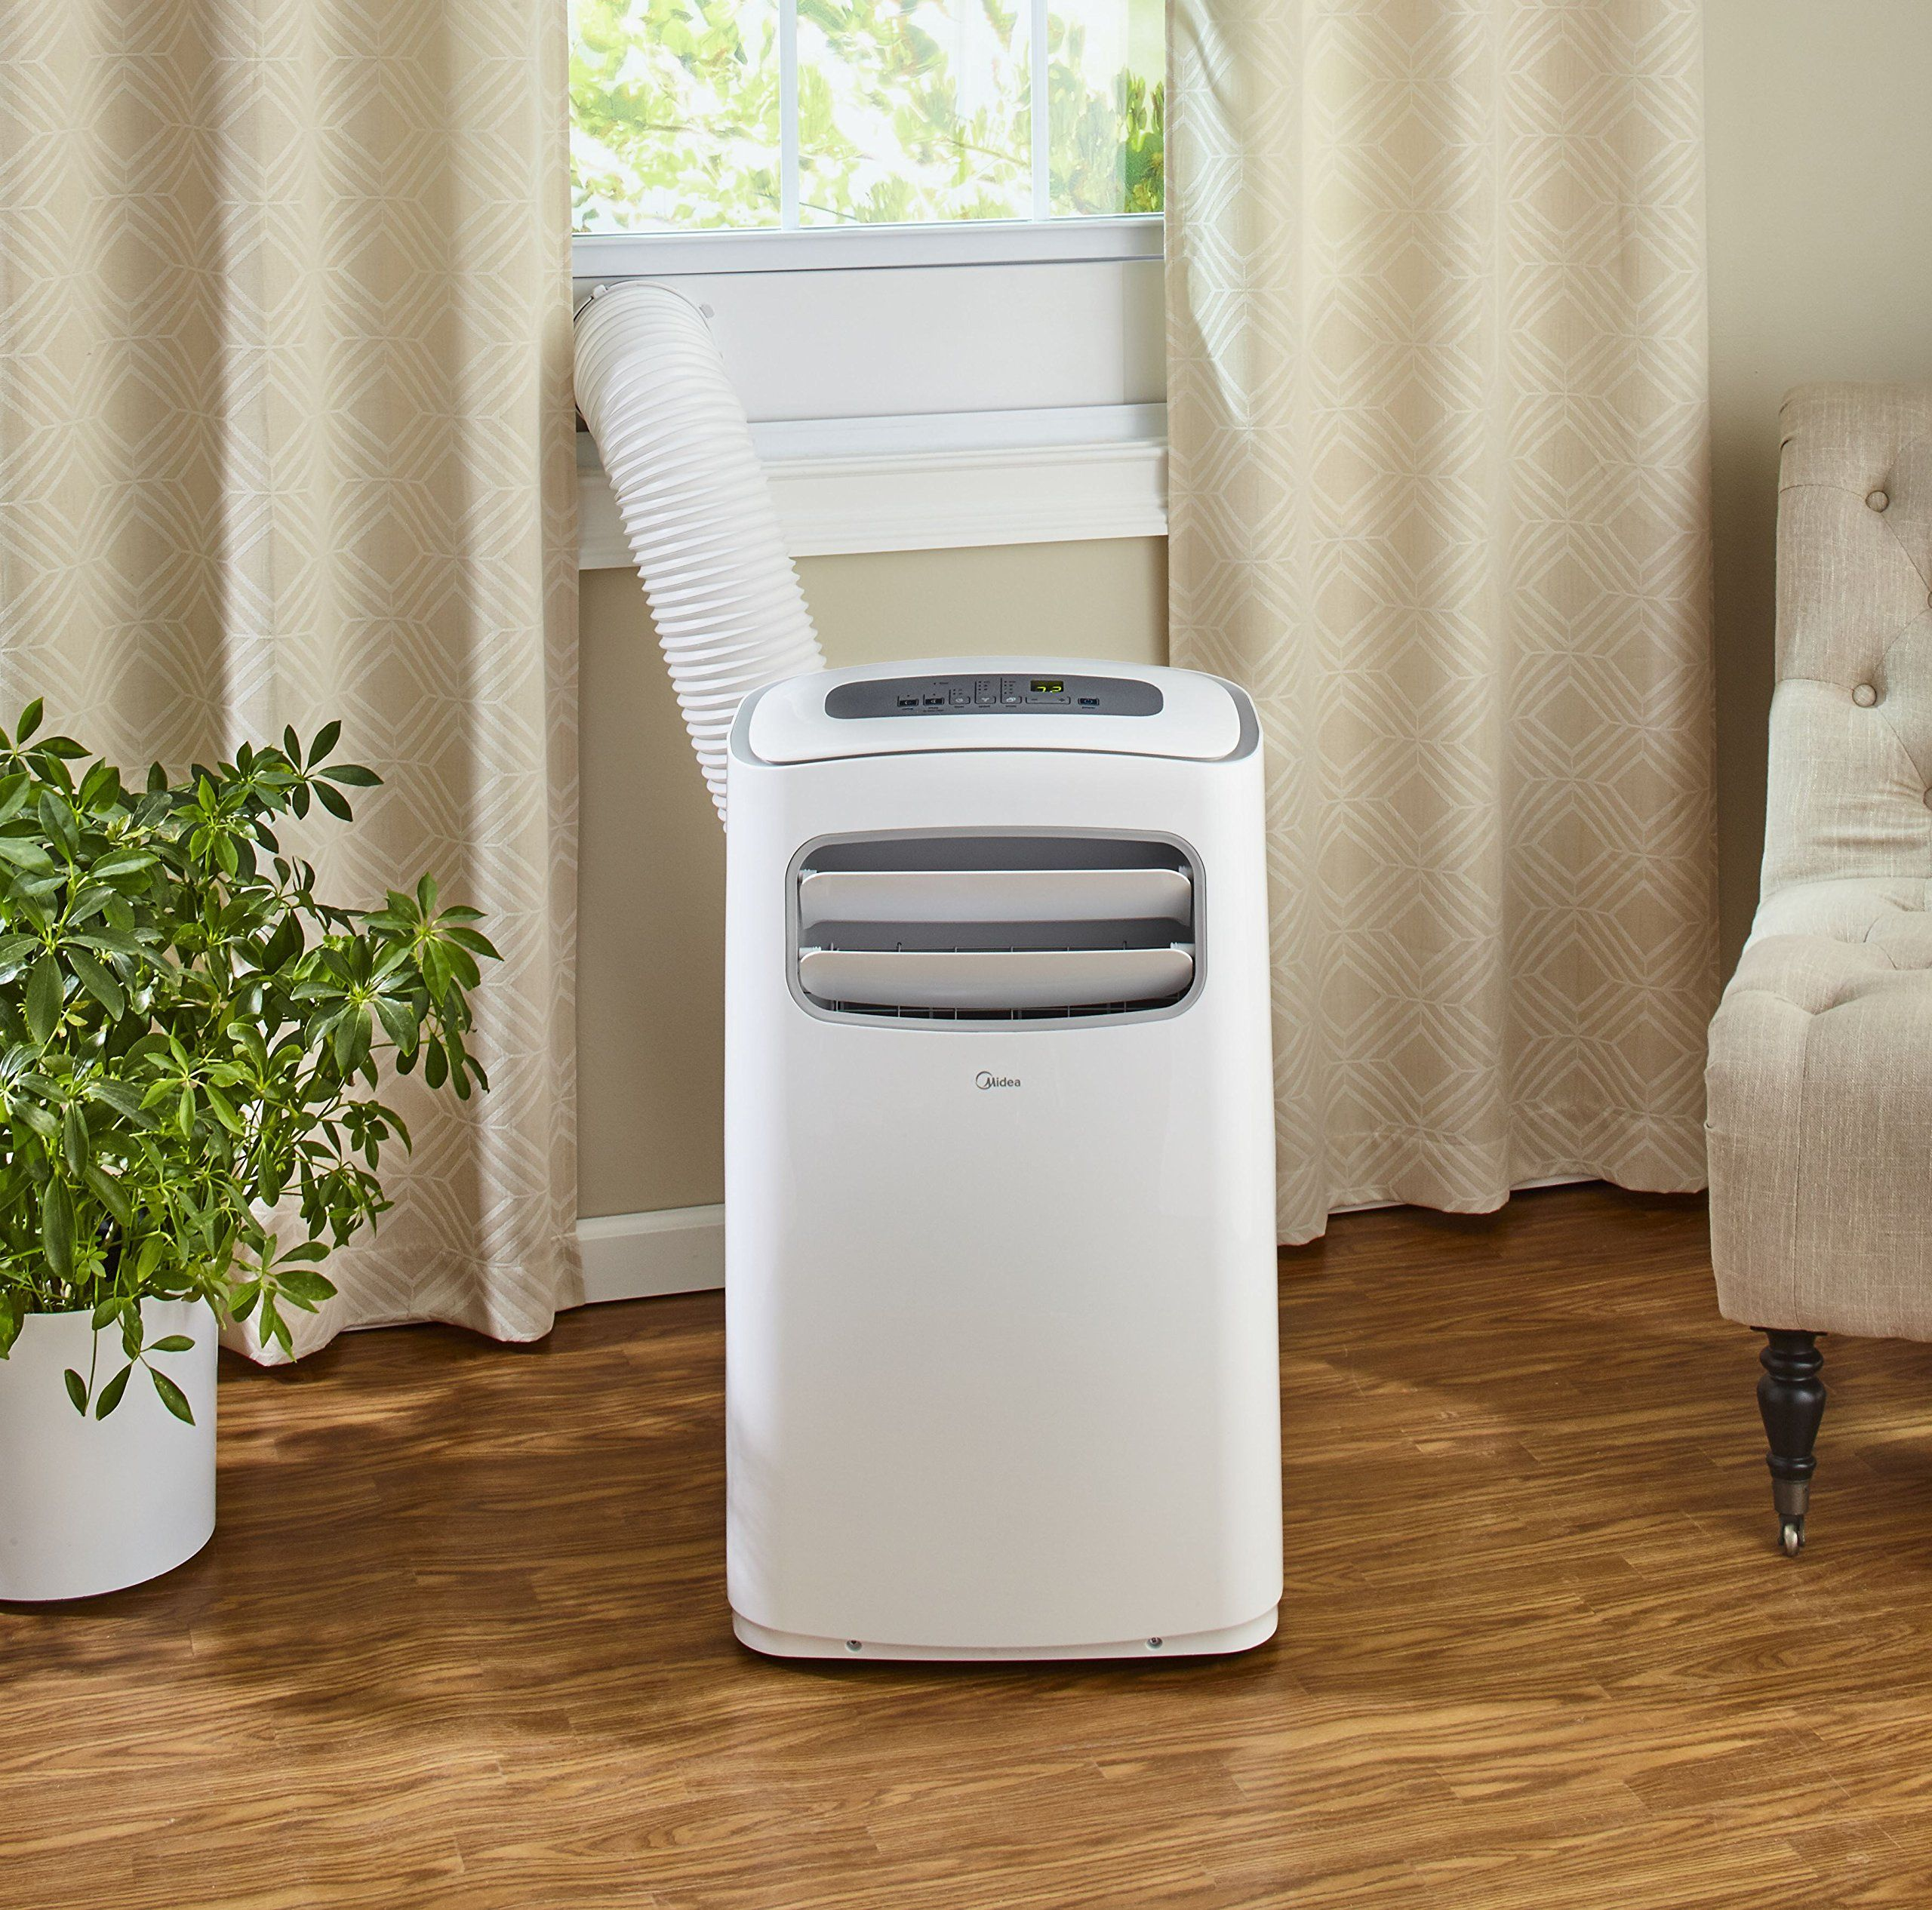 Image result for midea portable air conditioner - 10,000 btu capacity